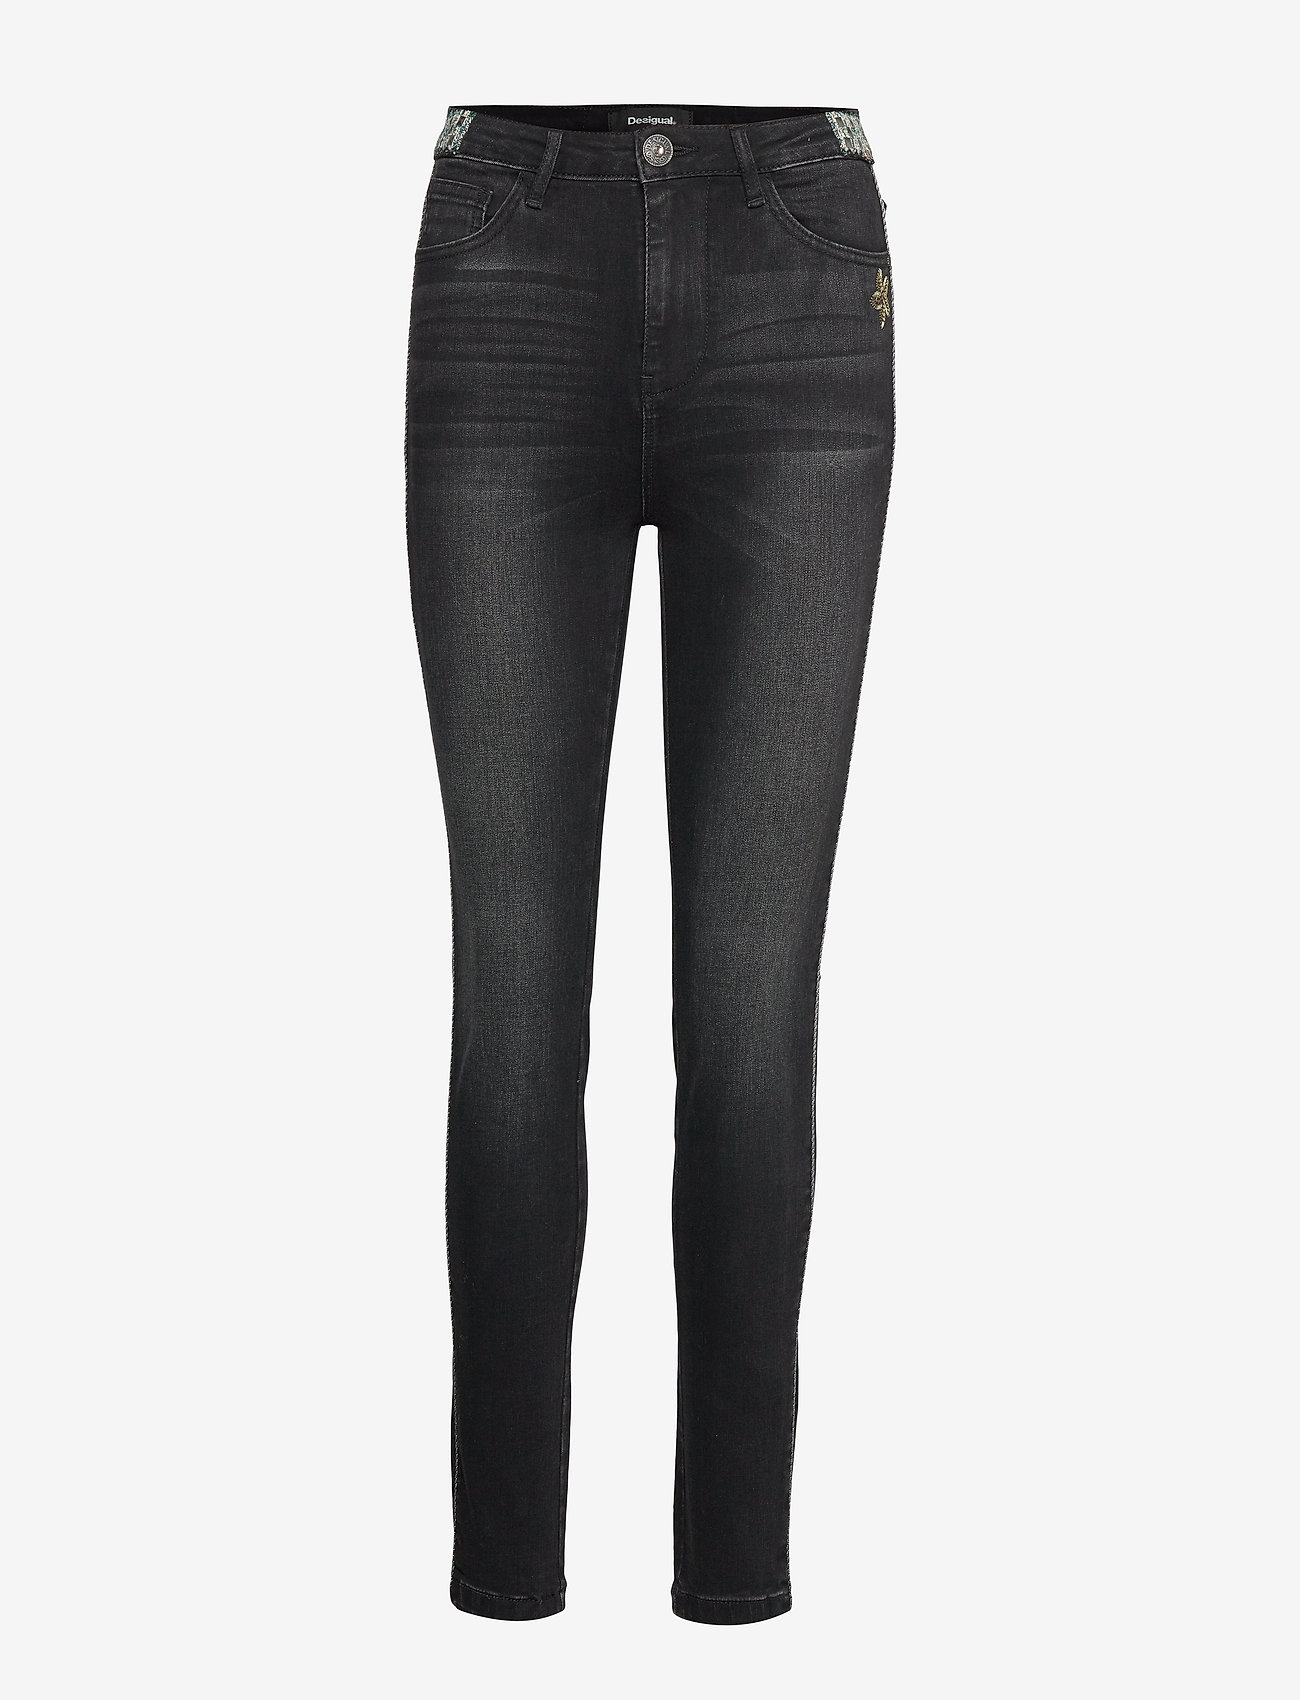 Desigual - DENIM NEW YOR - jeans skinny - denim black wash - 0